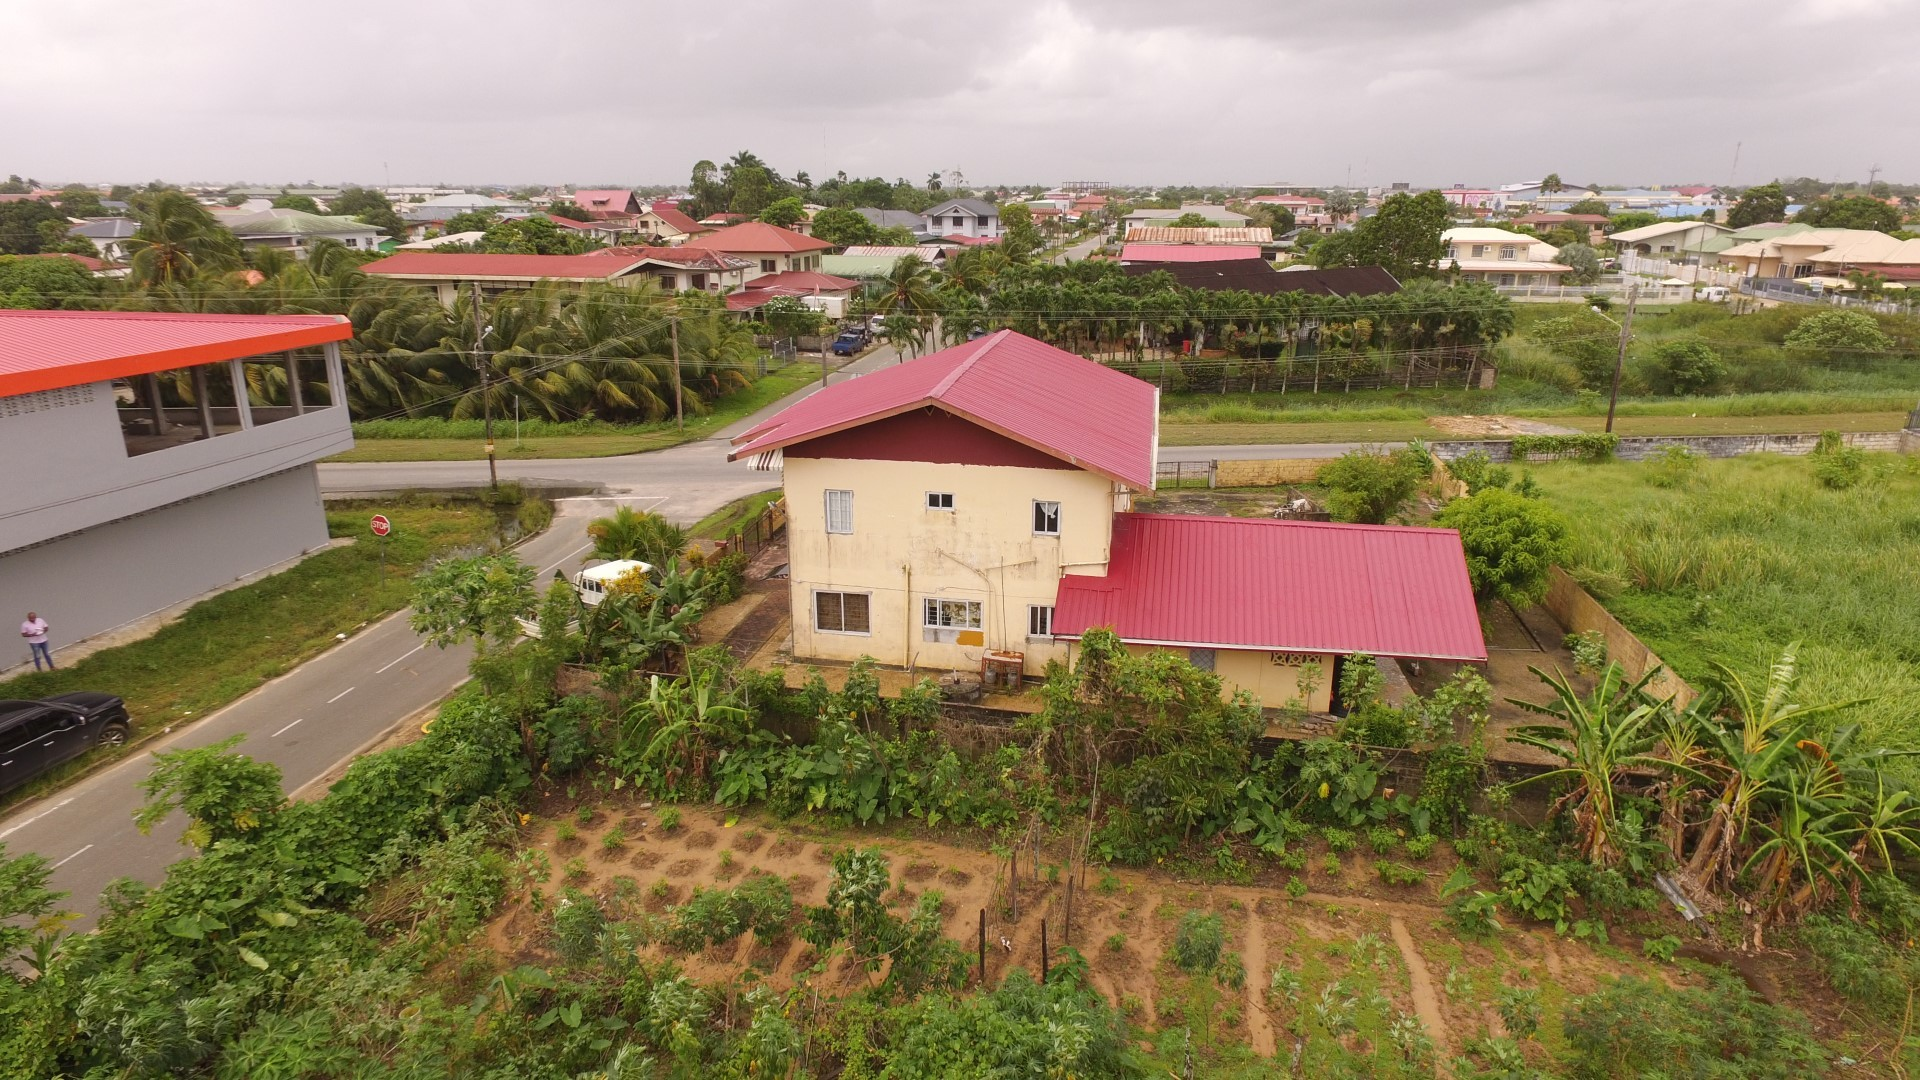 Henkielaan-32-Koopwoning-Terzol-Vastgoed-Paramaribo-Suriname-06